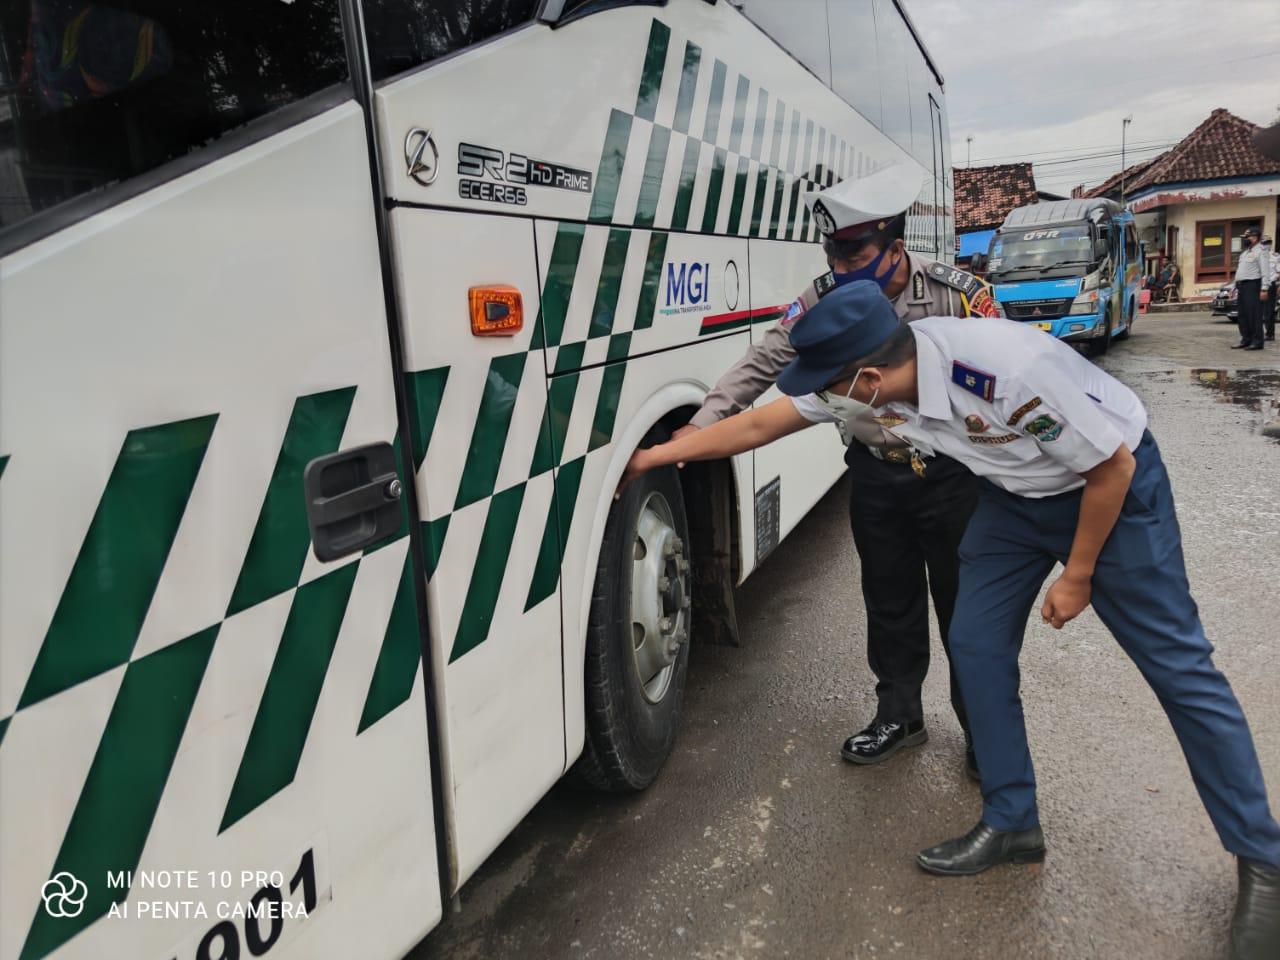 Jelang Libur Nataru, Satlantas Polres Majalengka Bersama Dishub Cek Kelayakan Kendaraan